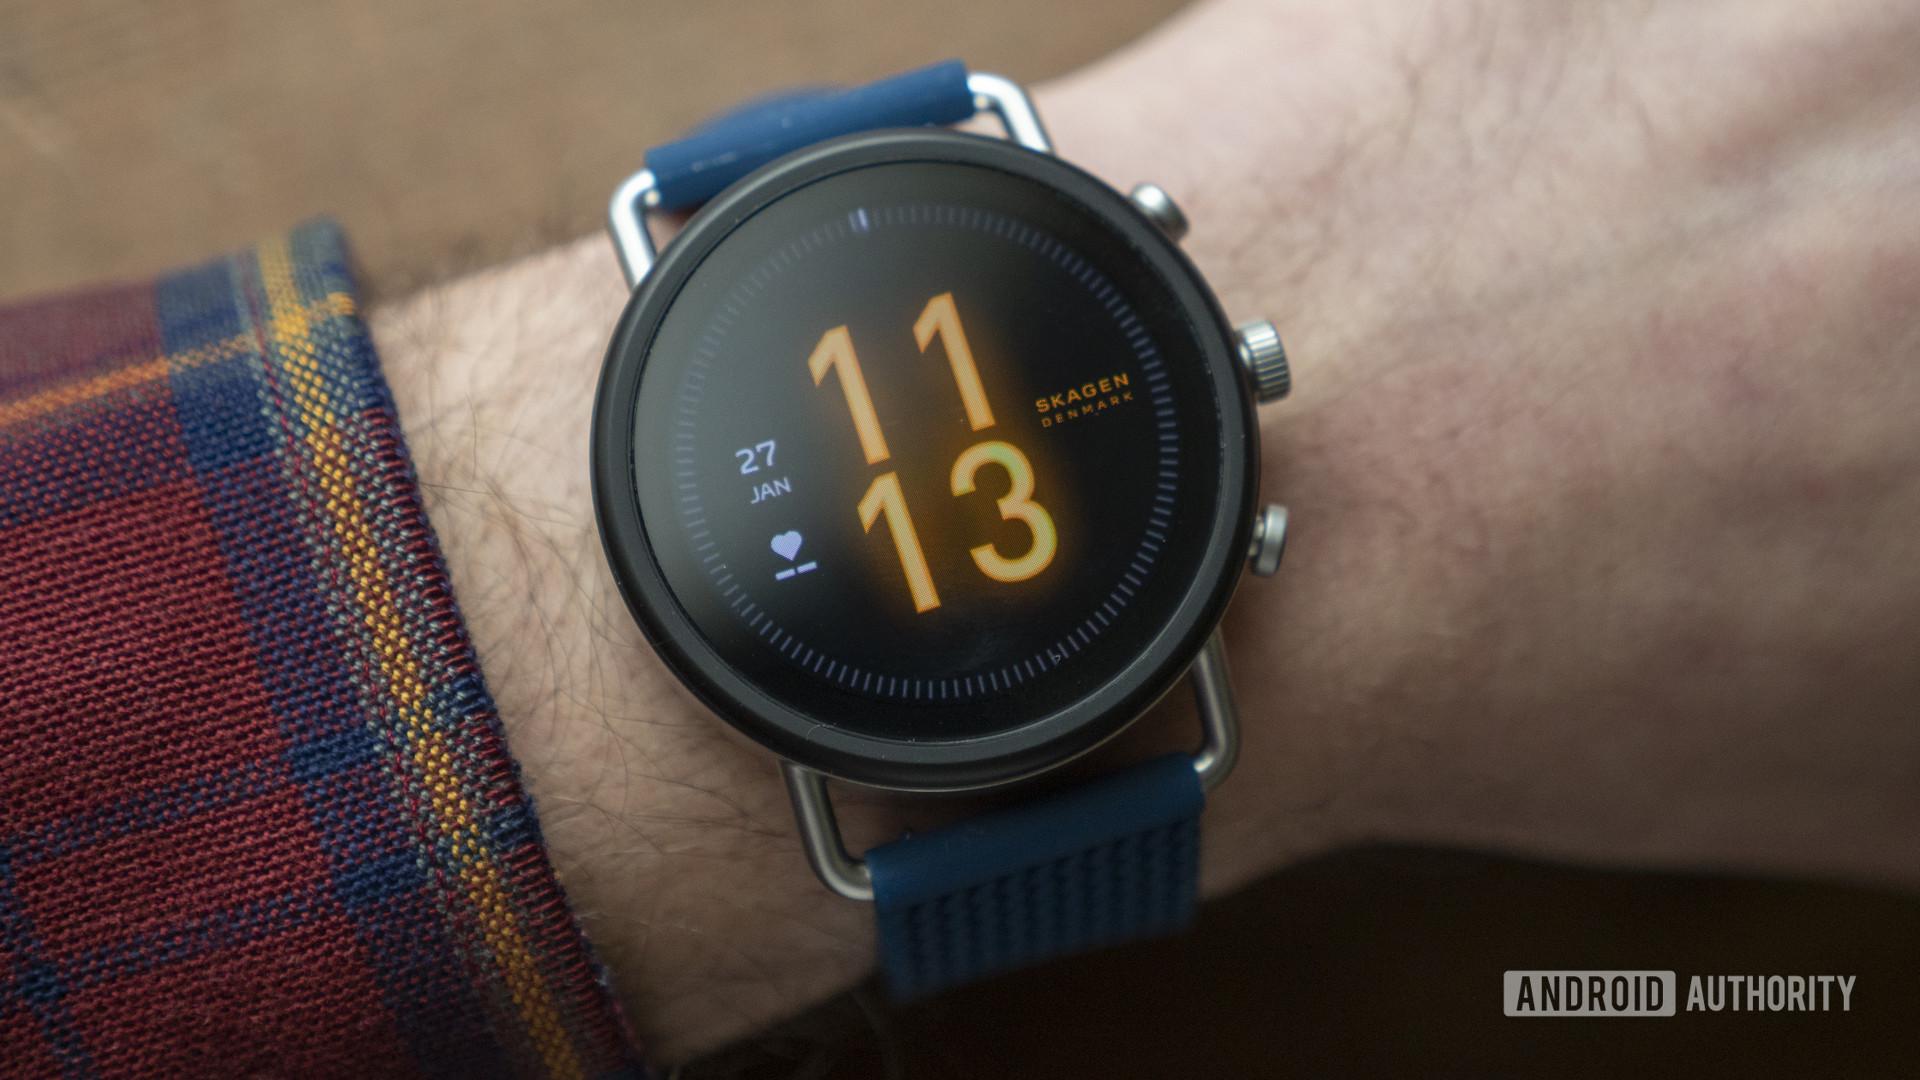 skagen falster 3 review watch face on wrist 1